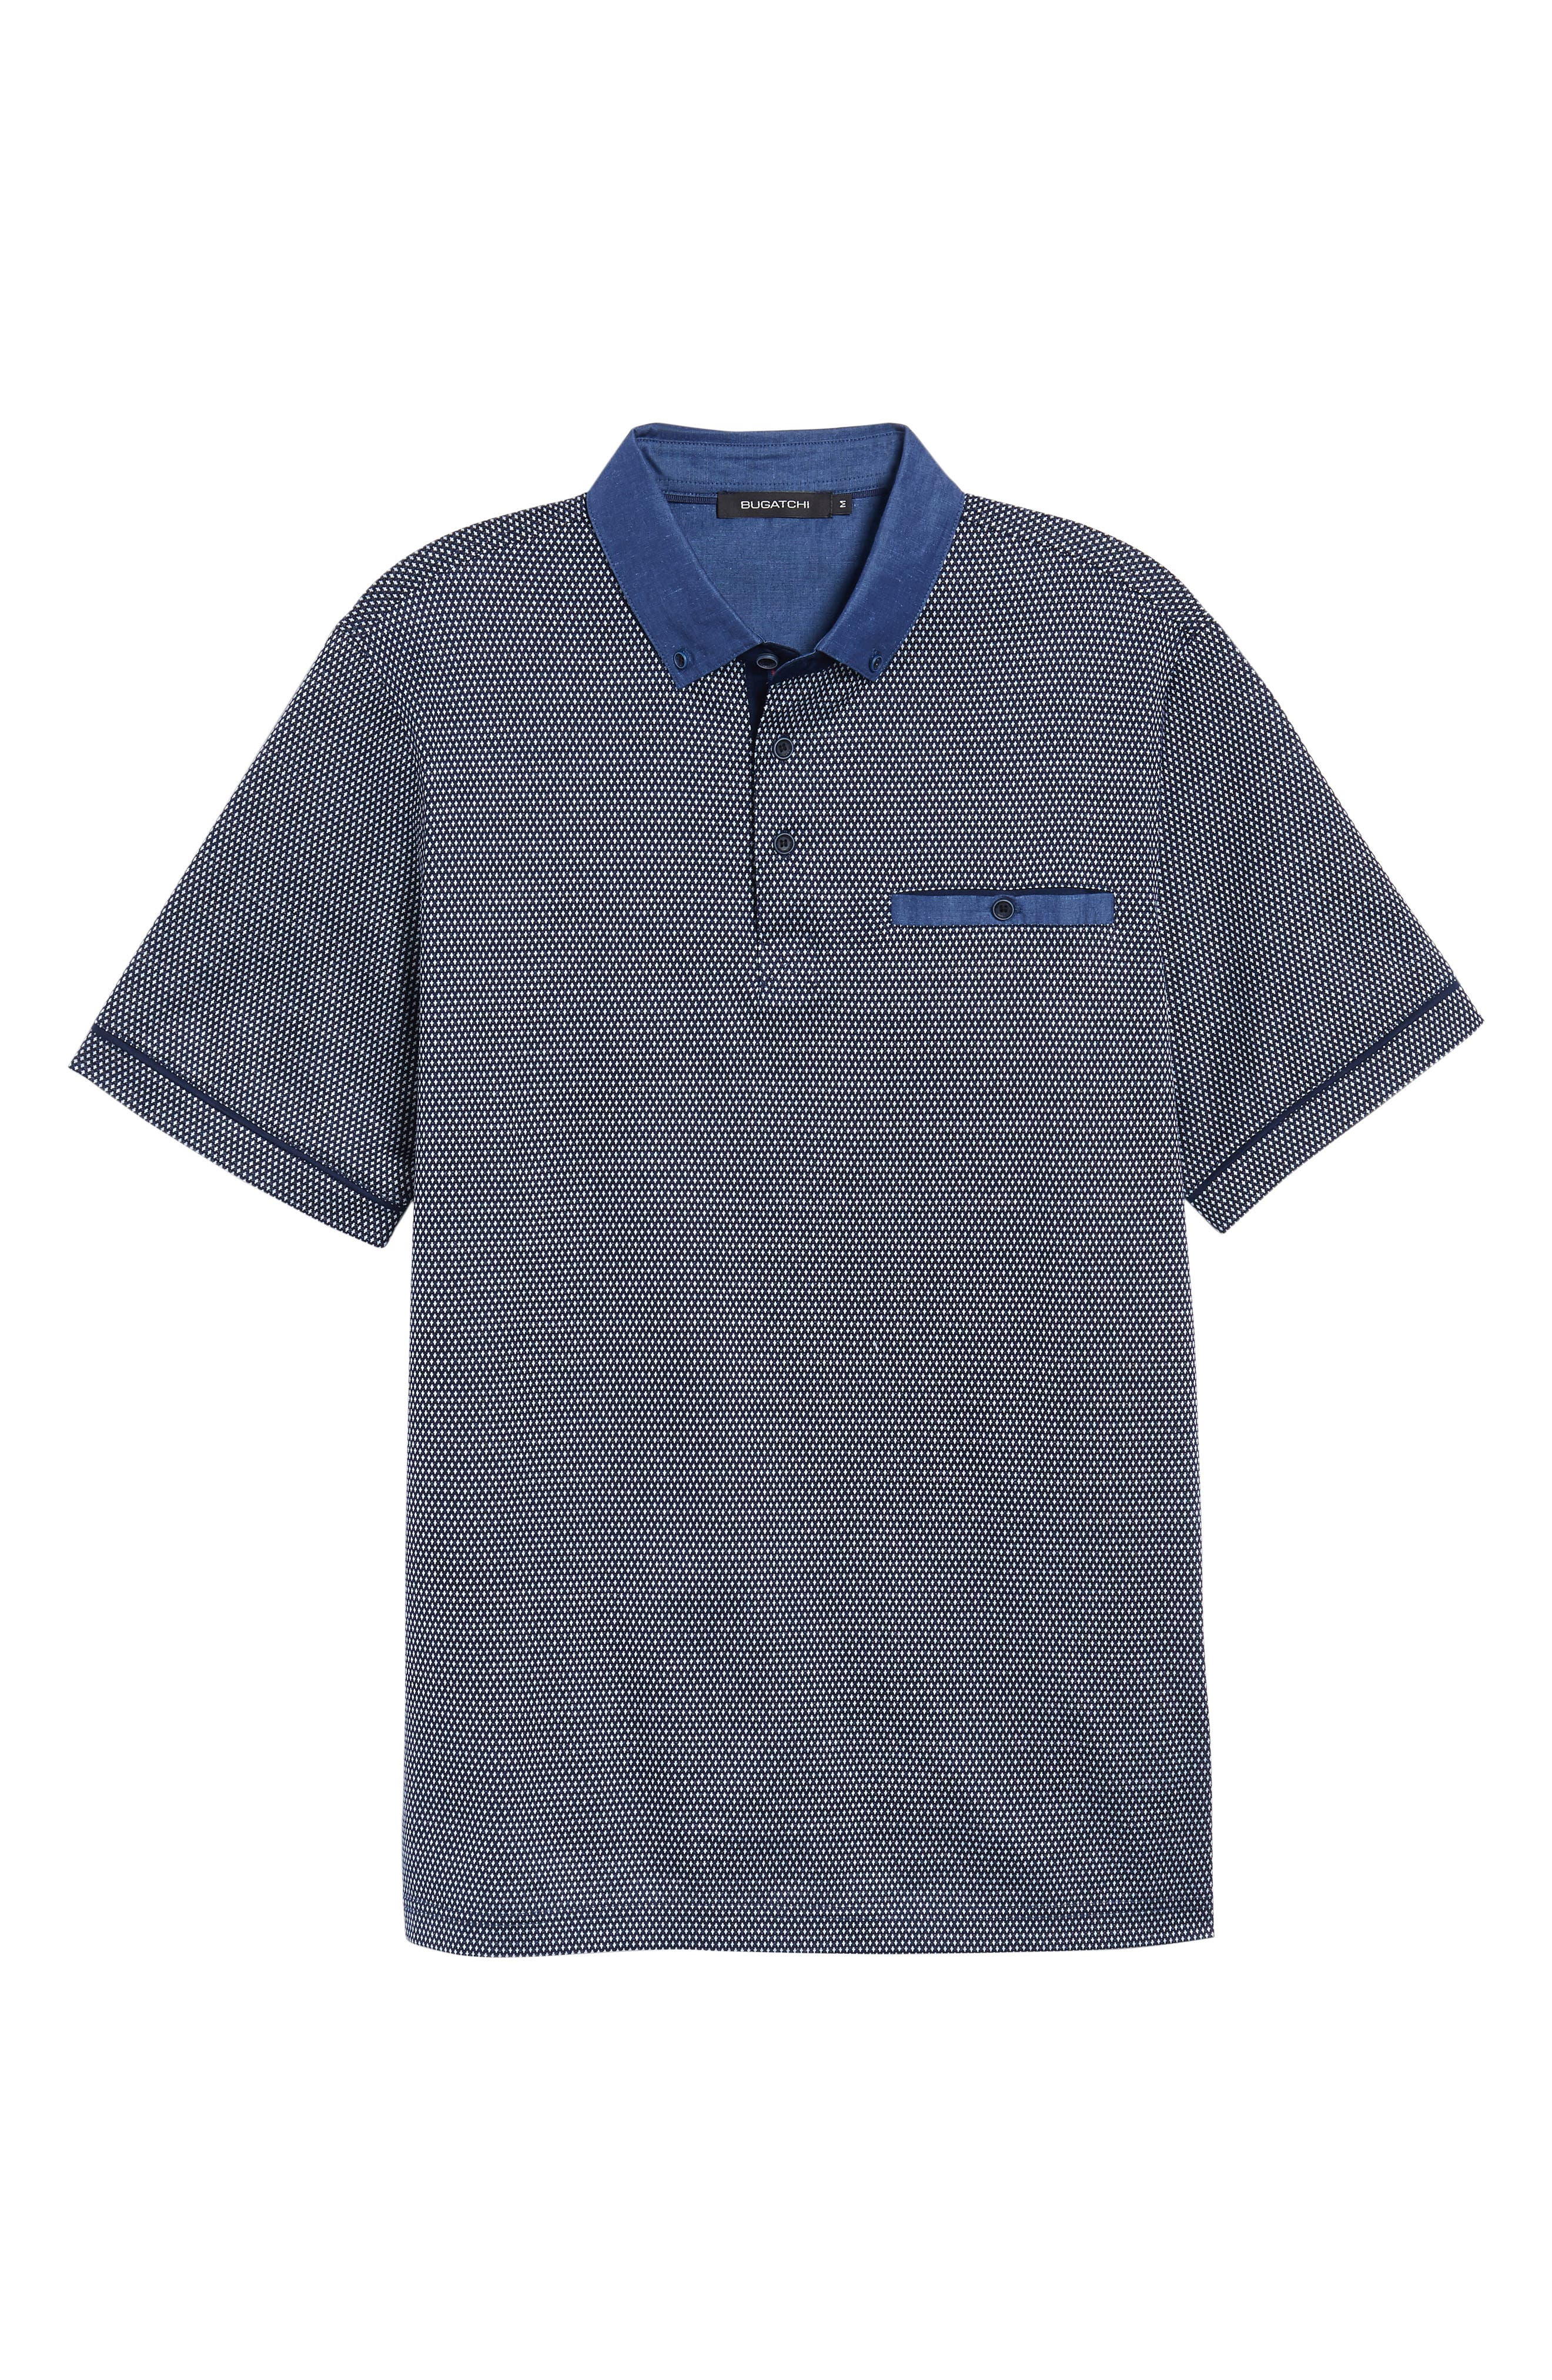 Regular Fit Knit Polo,                             Alternate thumbnail 6, color,                             Navy